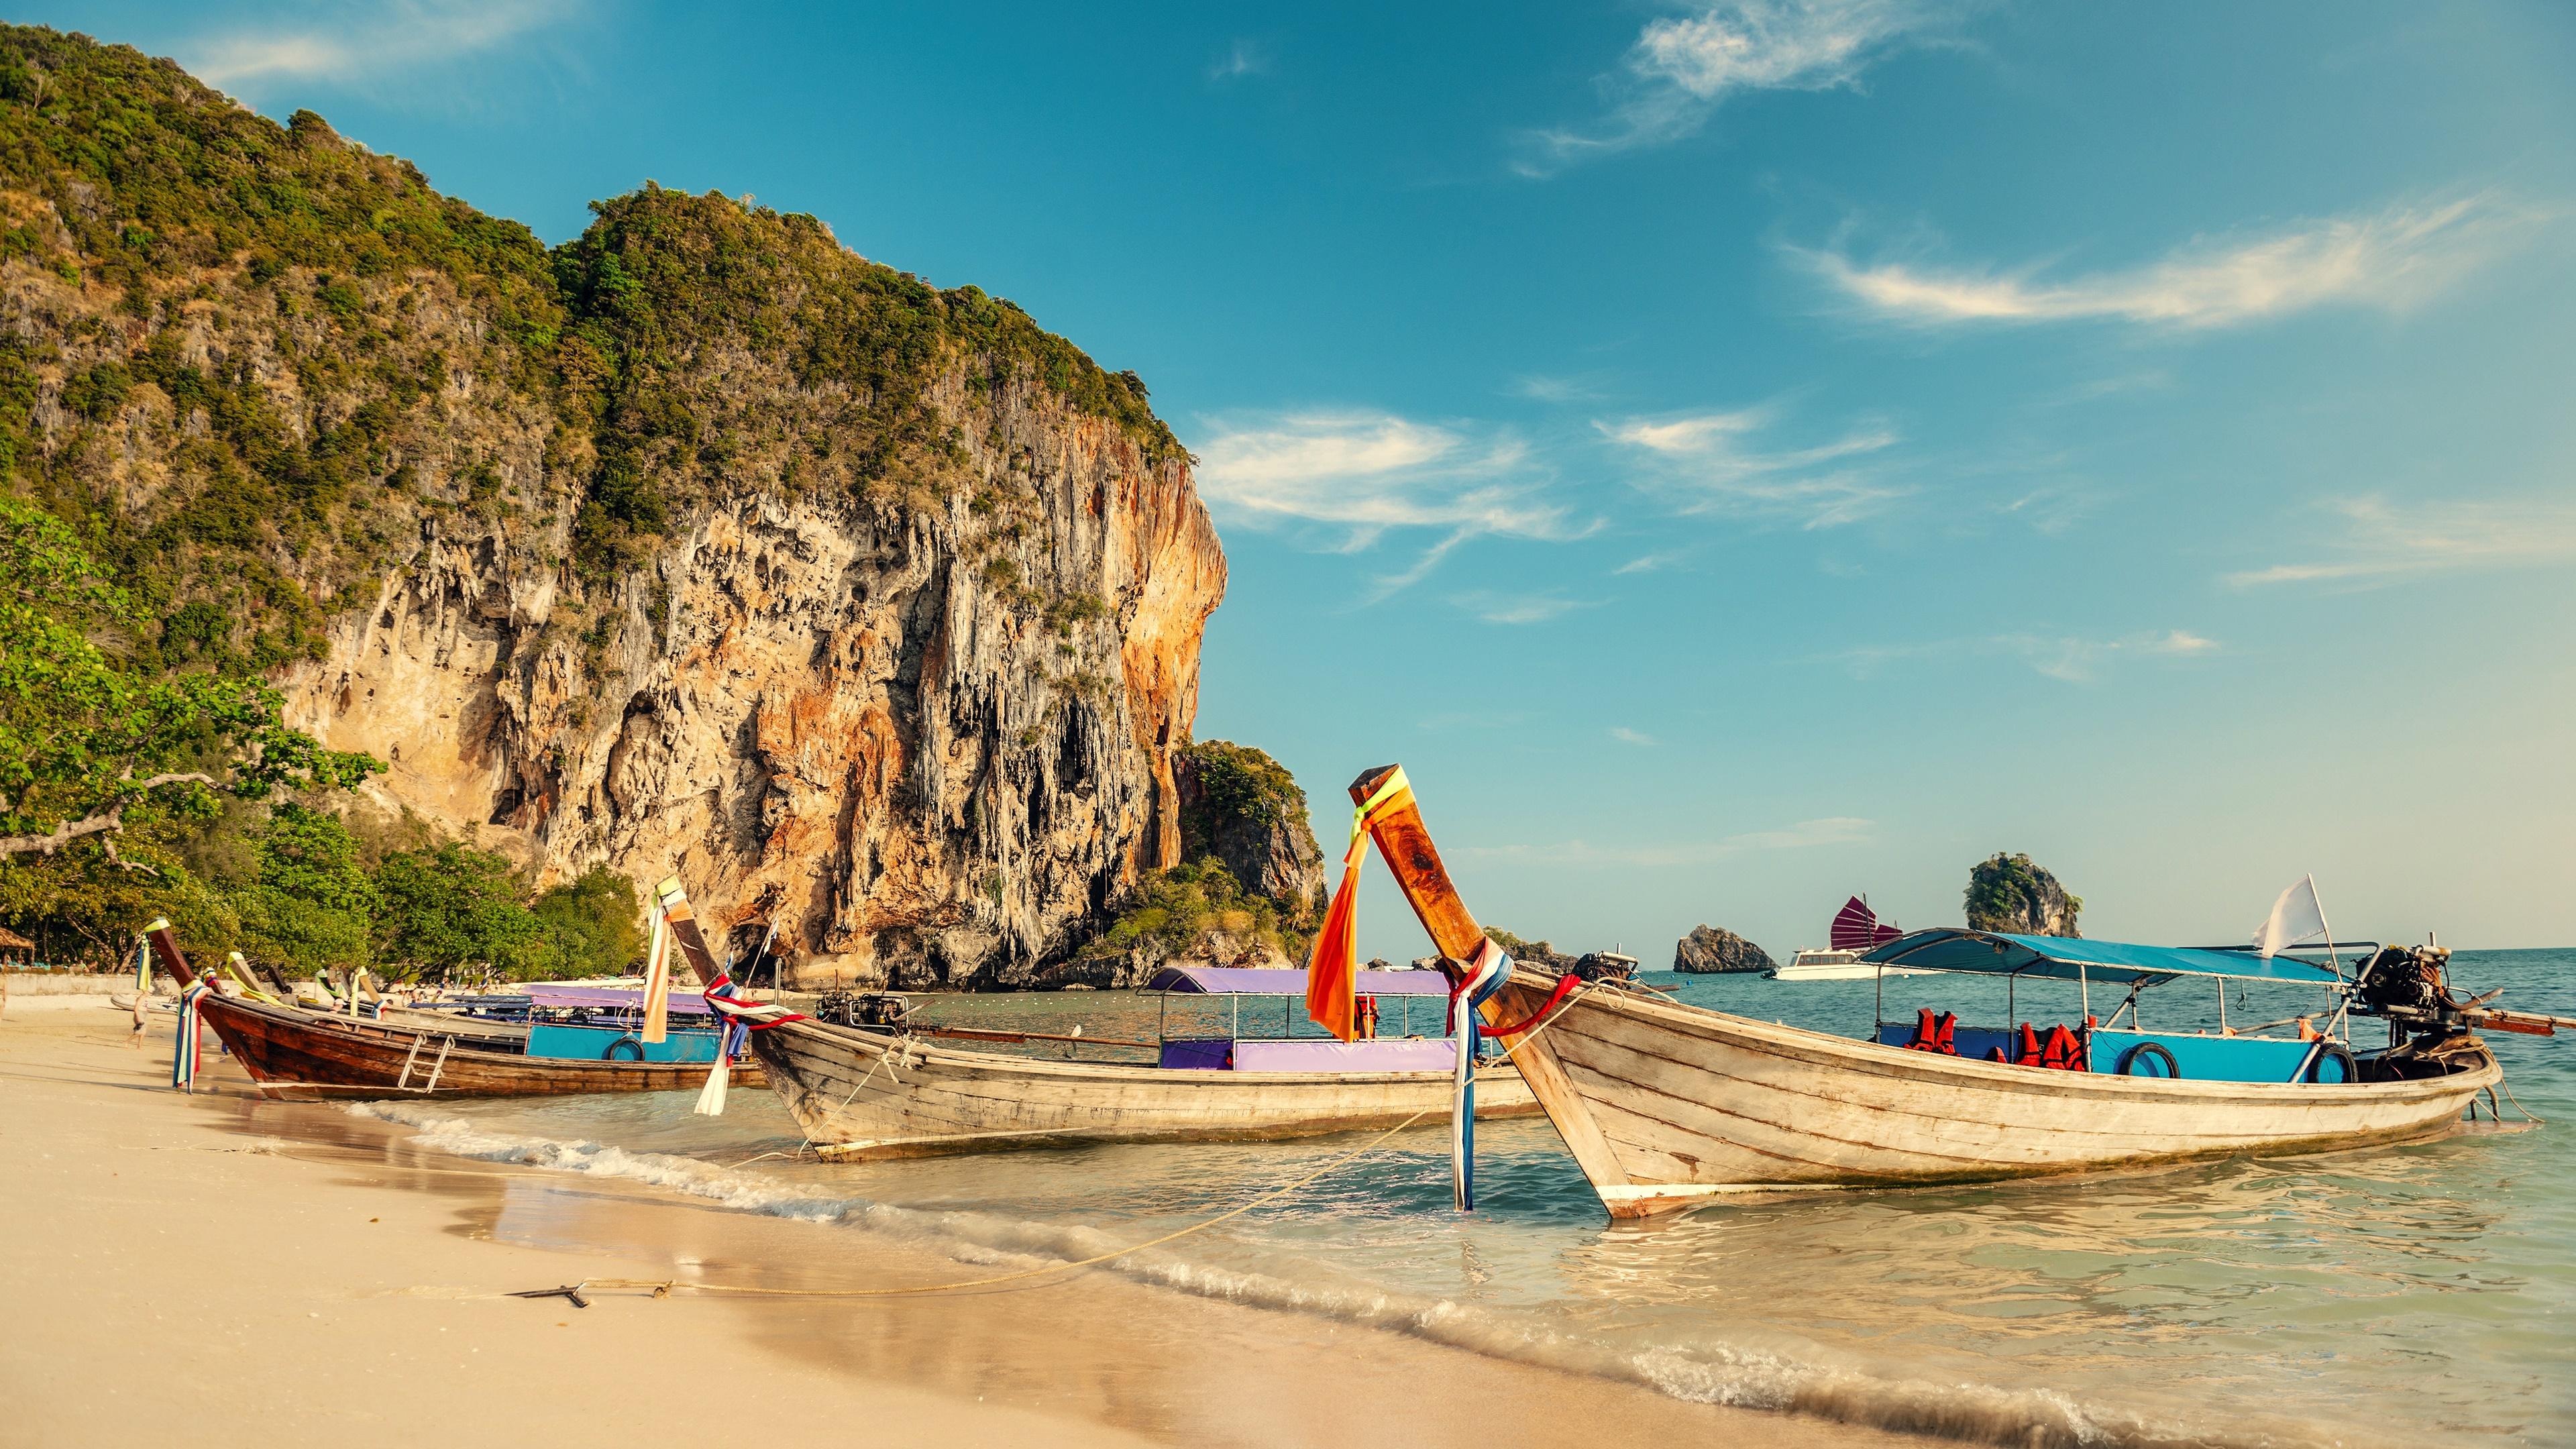 Boats on Railay Beach (Thailand) wallpaper